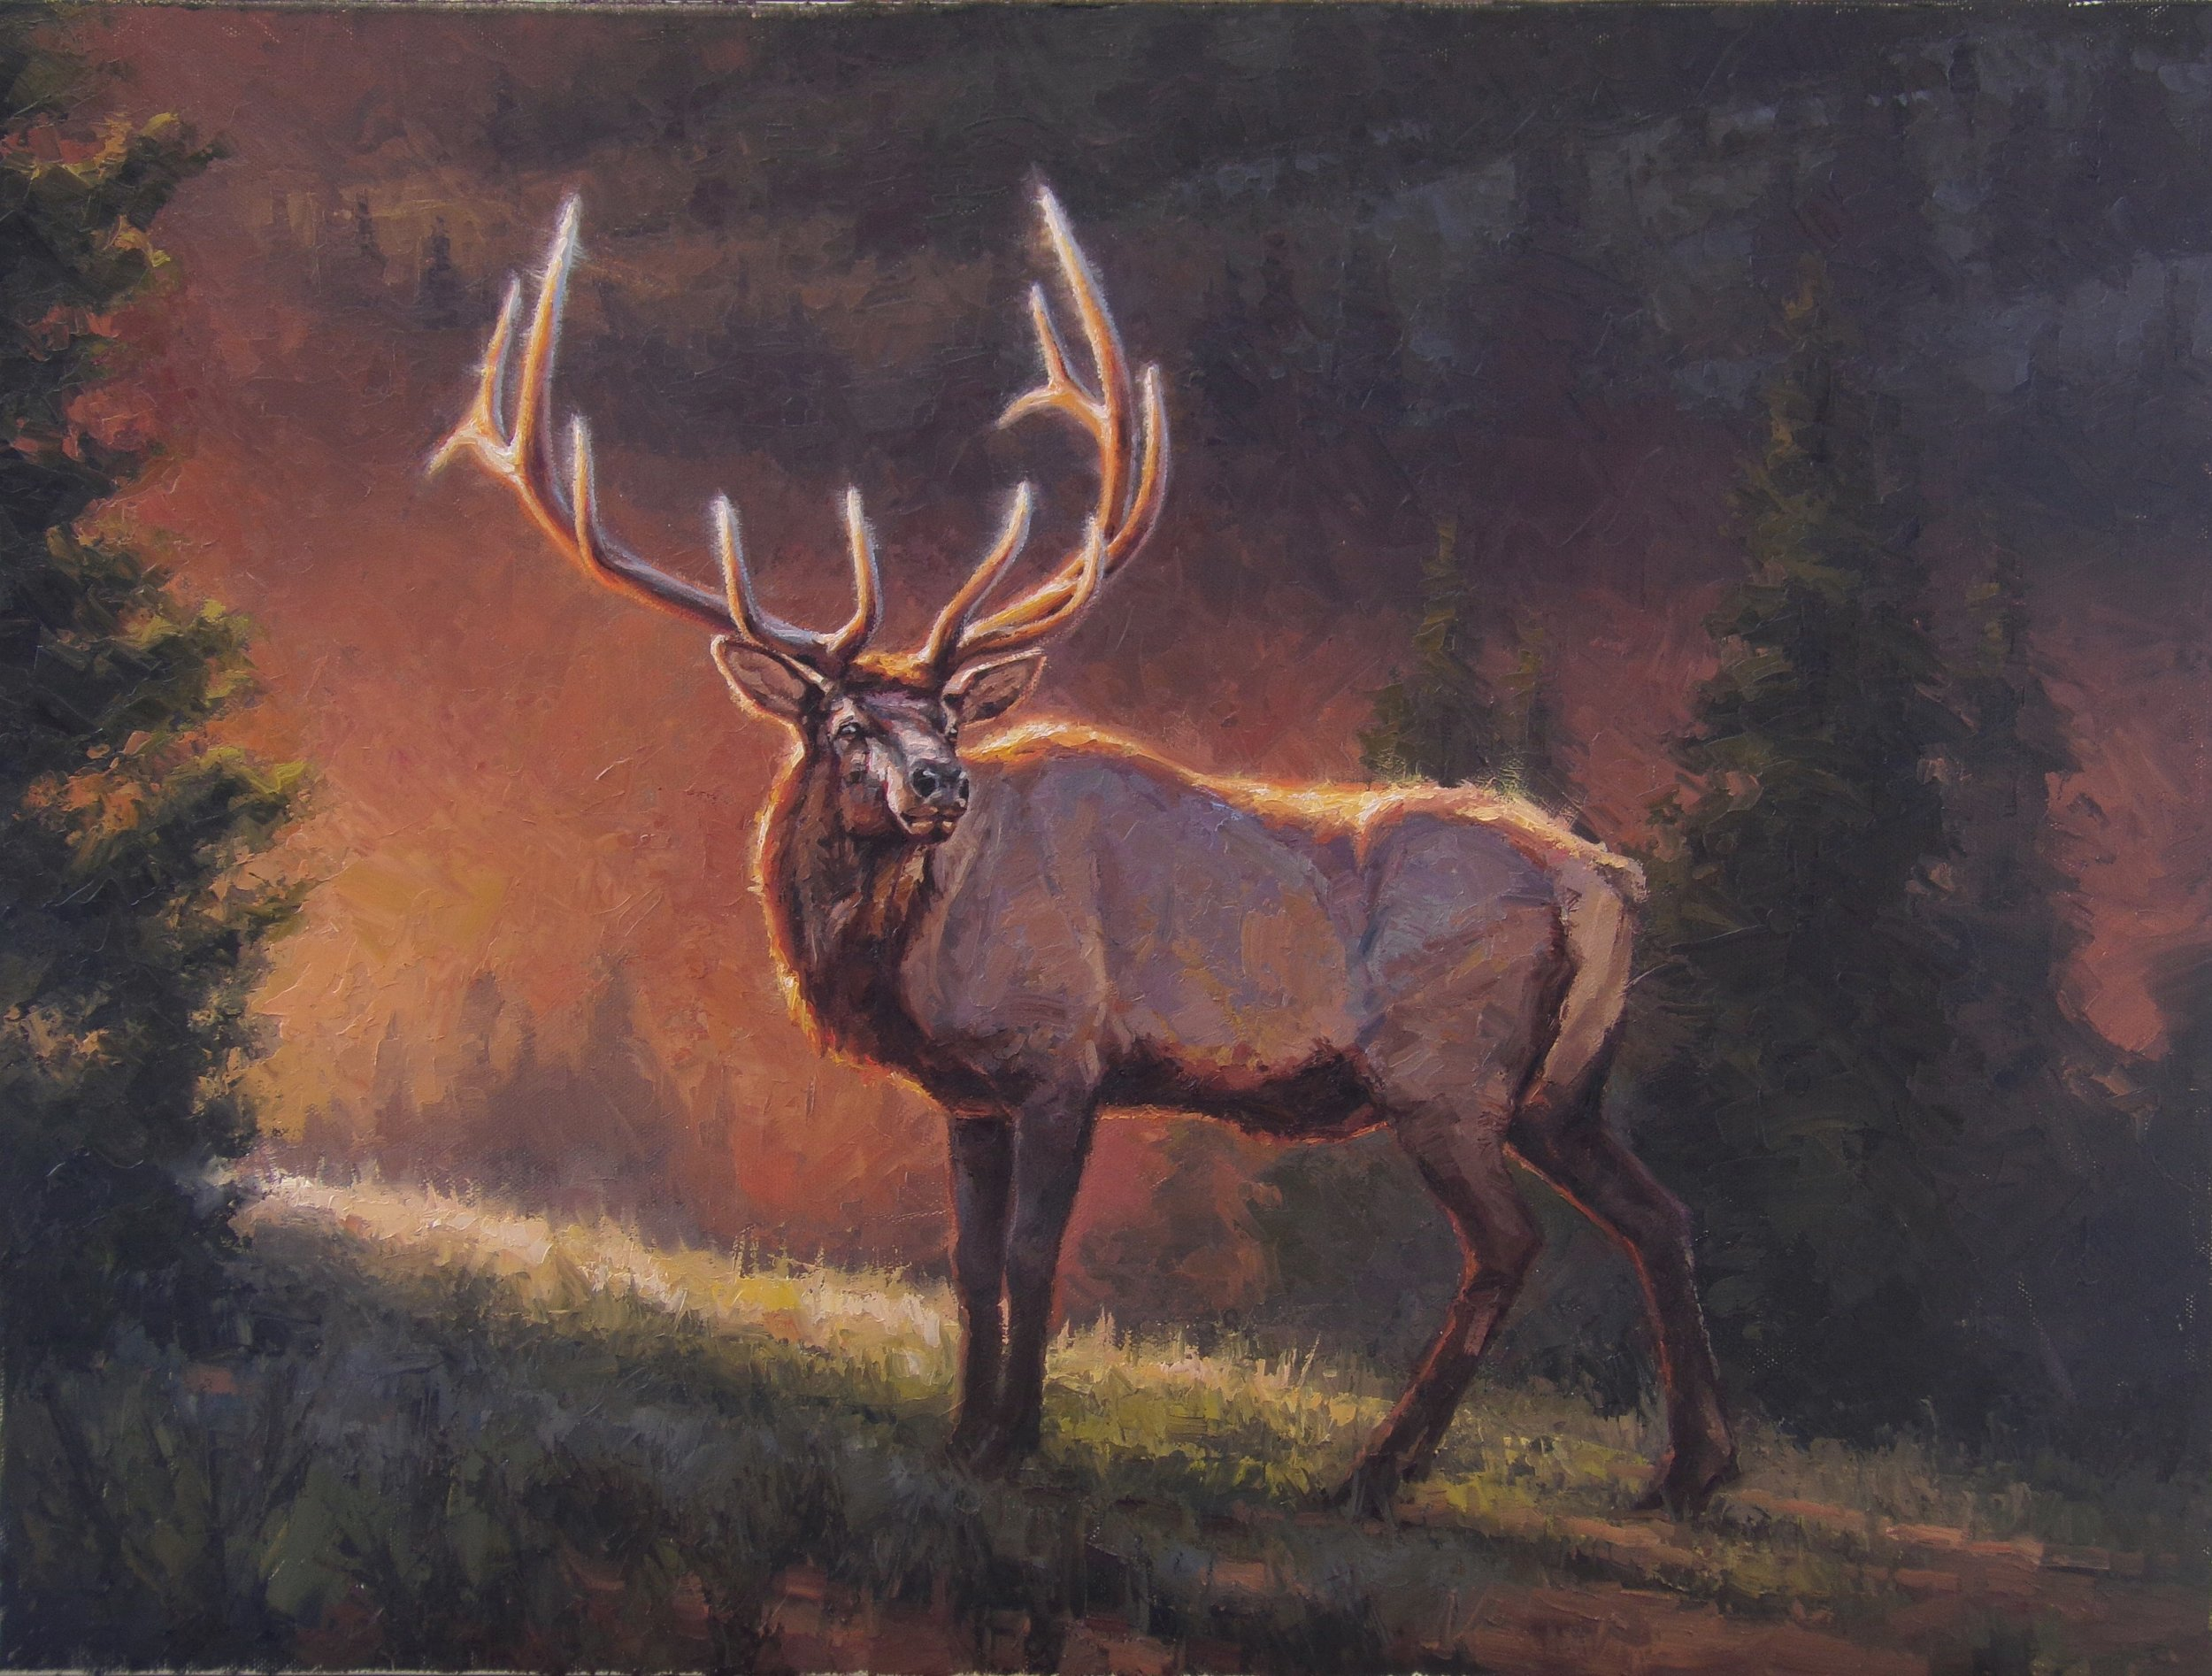 """Colorado Sunset"" - 18x24"" oil on canvas"